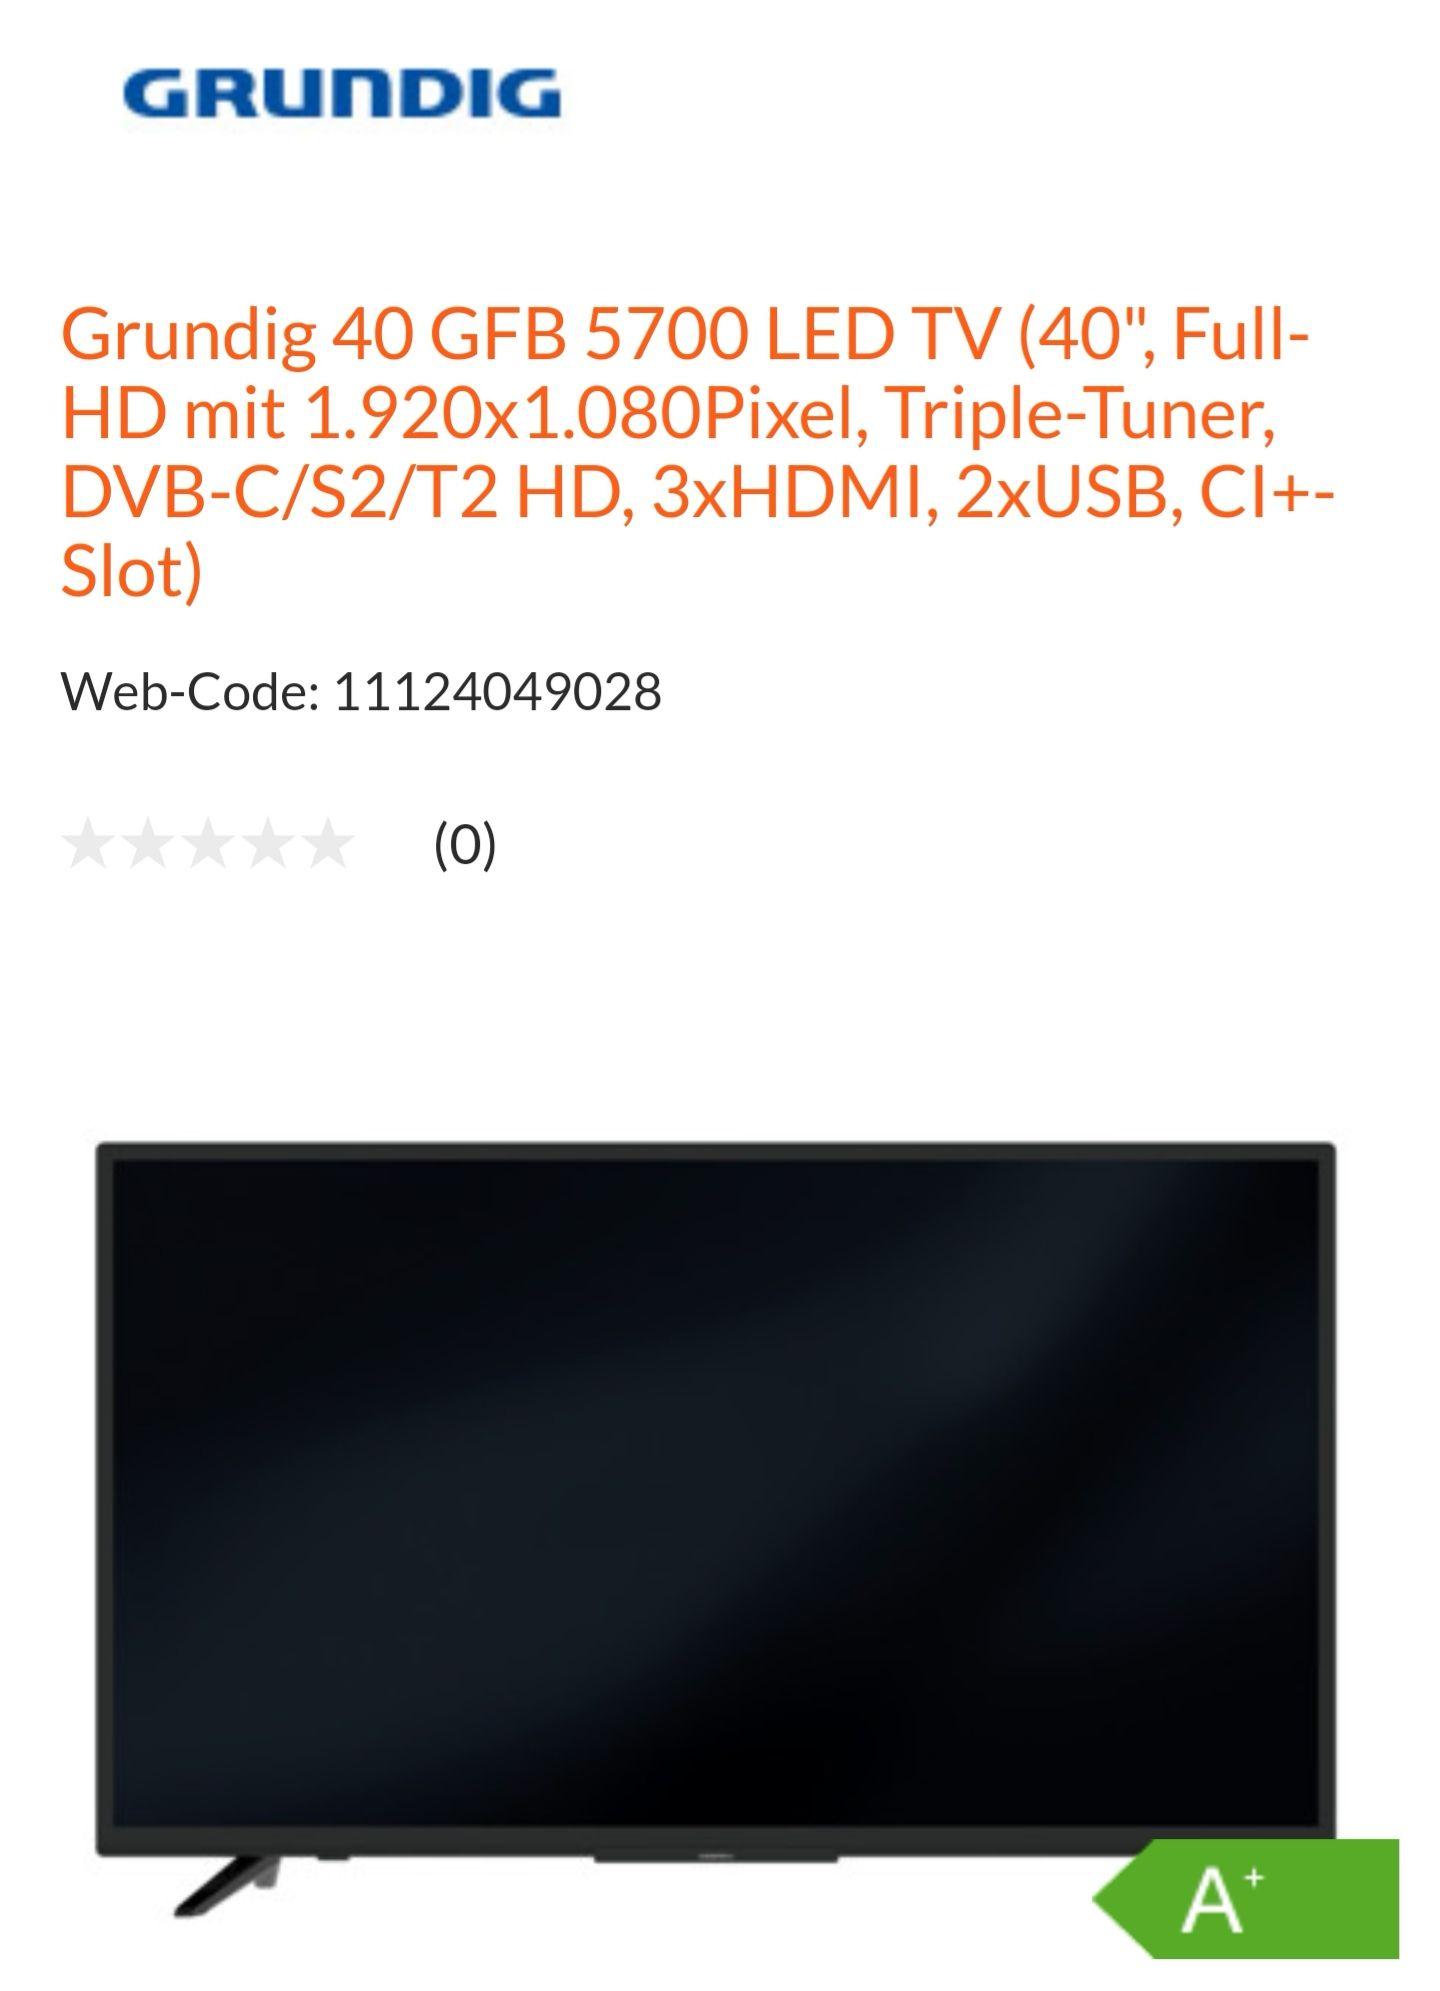 "Grundig 40 GFB 5700 LED TV (40"", Full-HD mit 1.920x1.080Pixel, Triple-Tuner, DVB-C/S2/T2 HD, 3xHDMI, 2xUSB, CI+-Slot)"